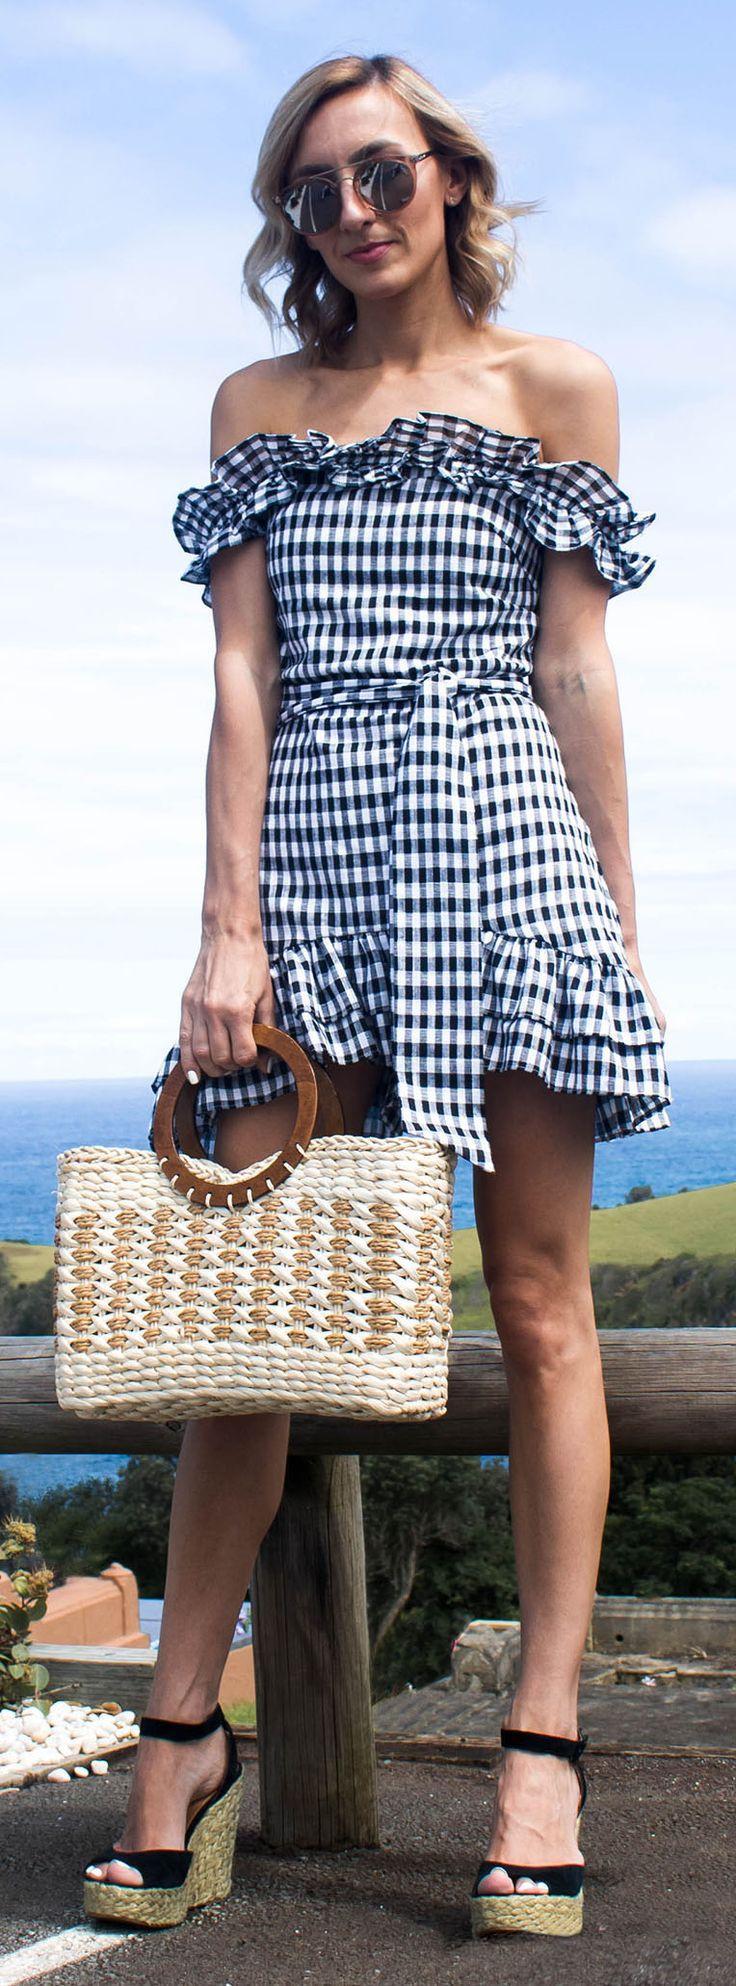 Gingham Dress, gingham frill, summer dress, black and white gingham dress, summer dress, summer style, straw bag, beach bag, black wedges, monochrome outfit @thelustlife_